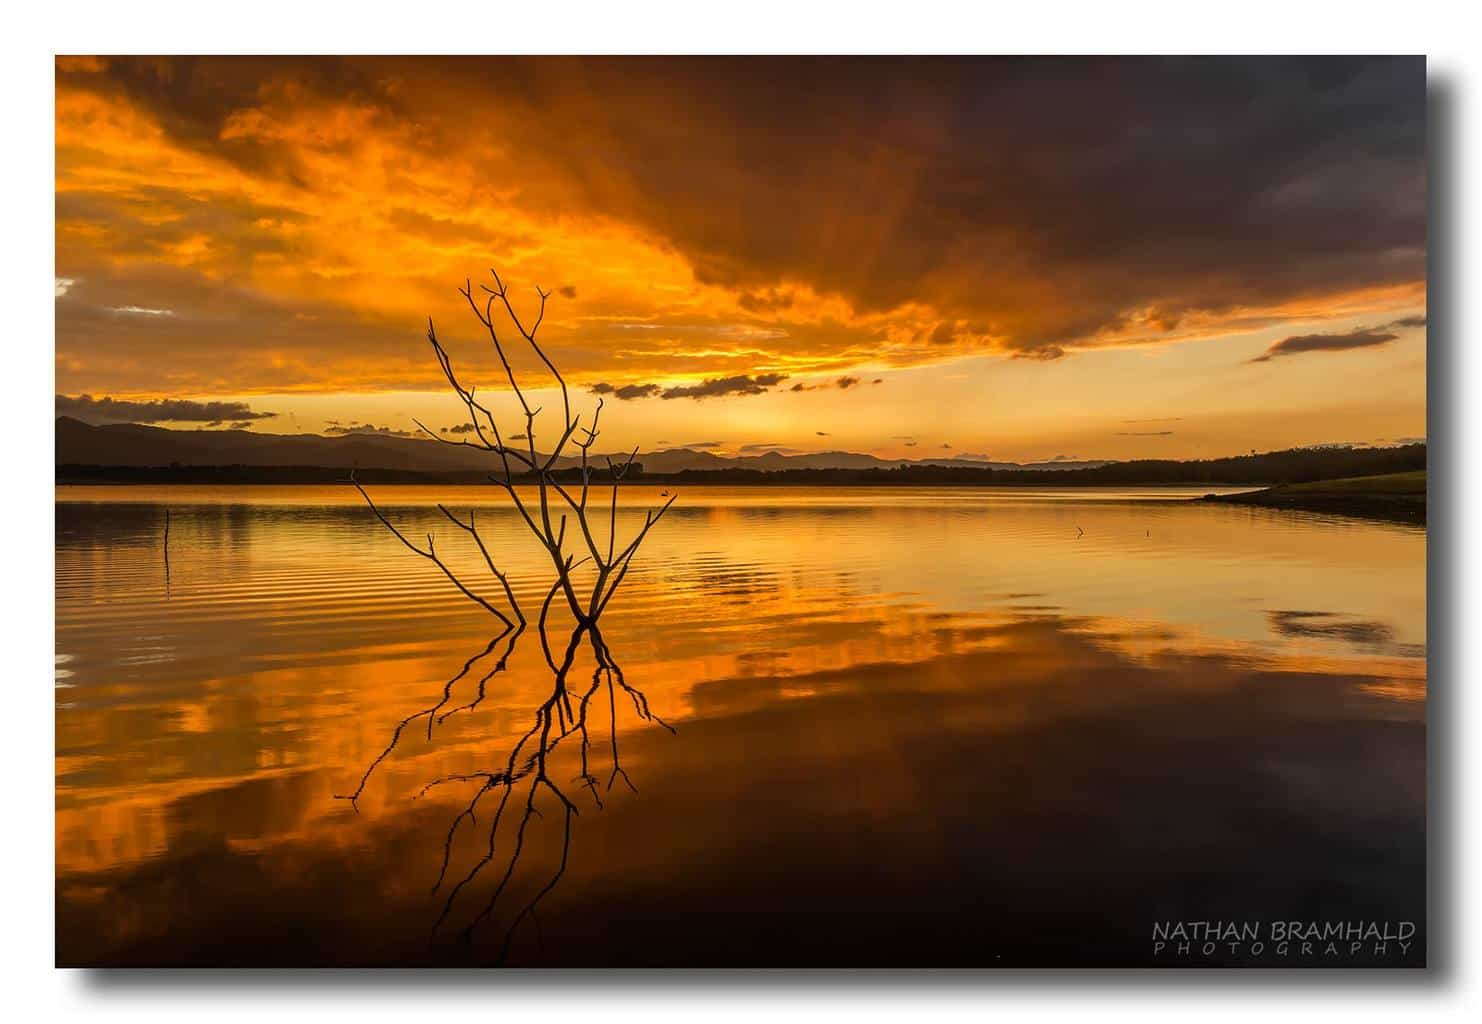 Stunning sunset taken at Lake Samsonvale, QLD. Australia on Thursday. Shot taken with a Canon 5D MkIII + 35mm Lens.  1/25 sec / f11 / ISO 100 (No filters)